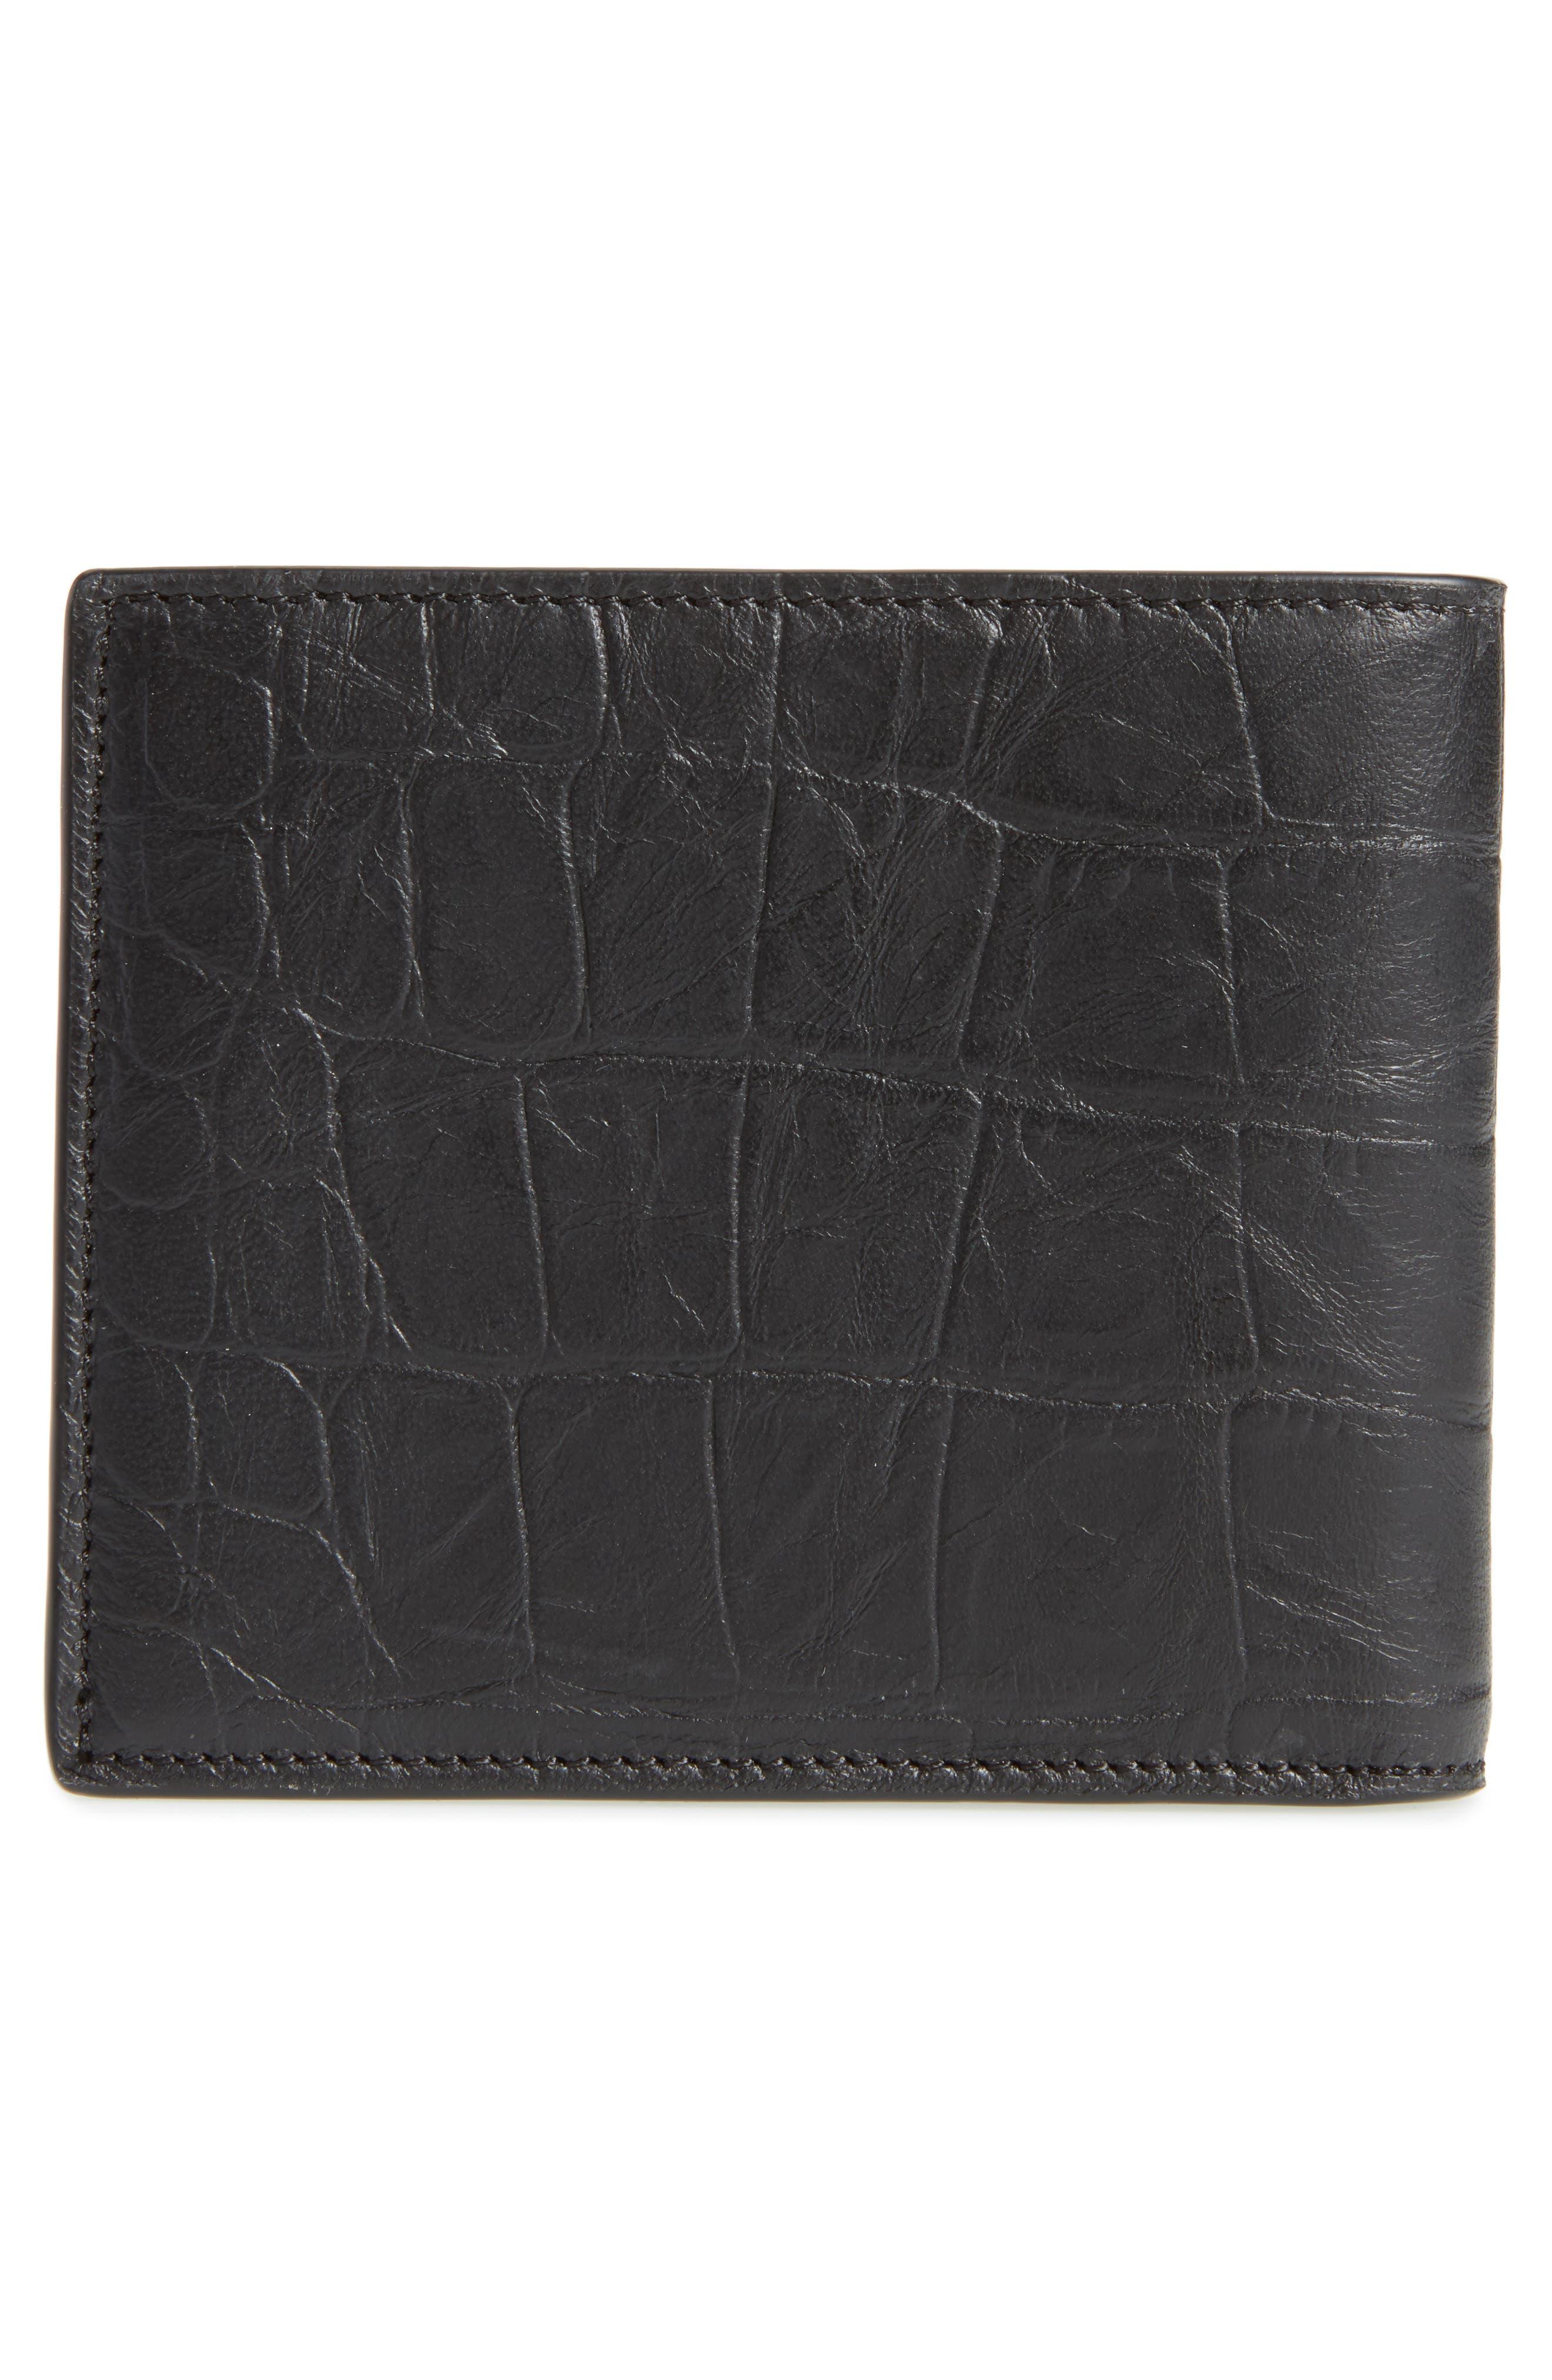 Croc Embossed Leather Wallet,                             Alternate thumbnail 3, color,                             Black